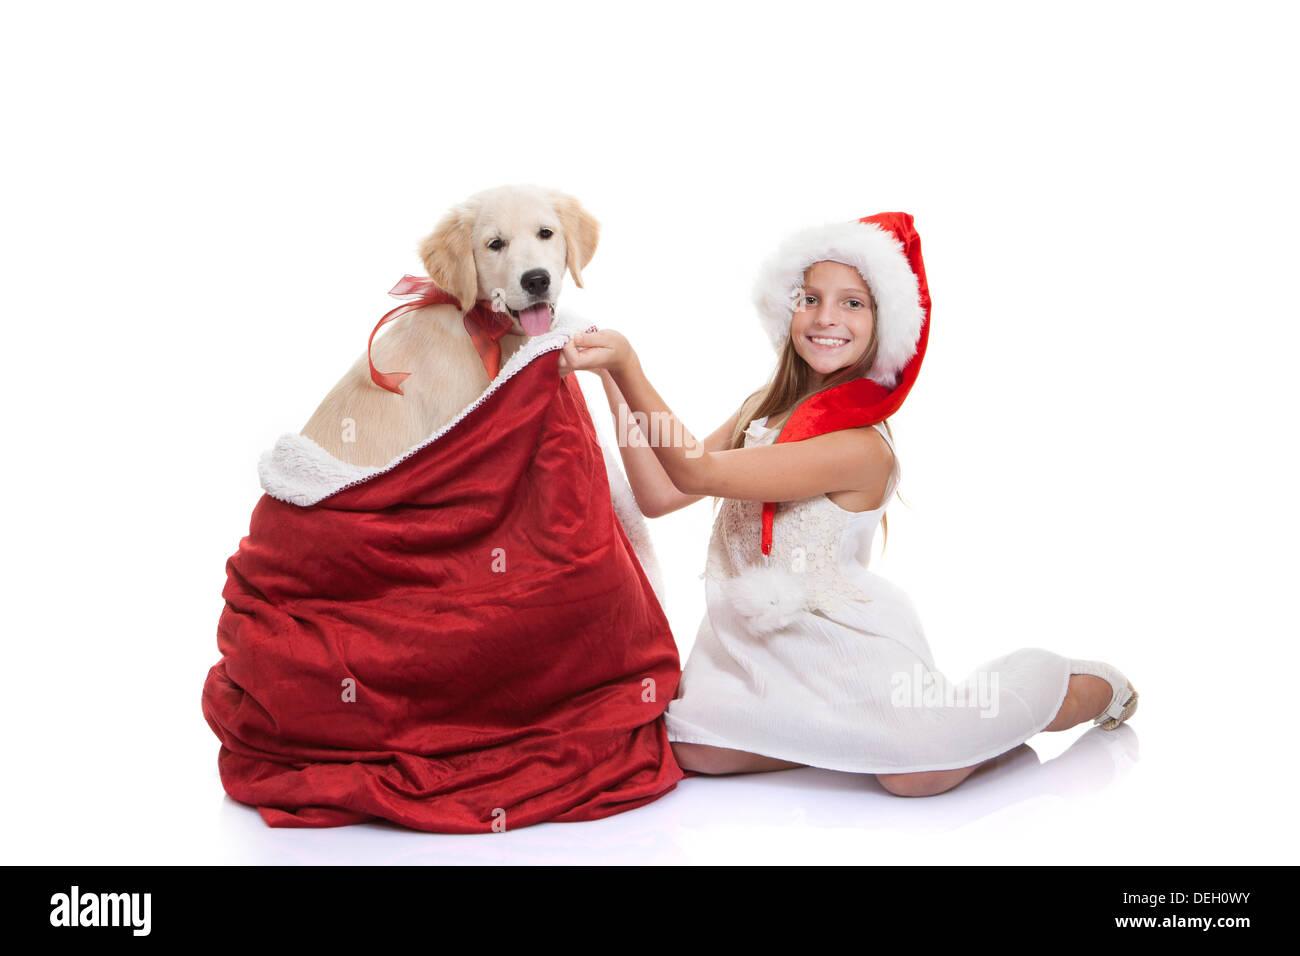 christmas holiday childs pet dog gift - Stock Image